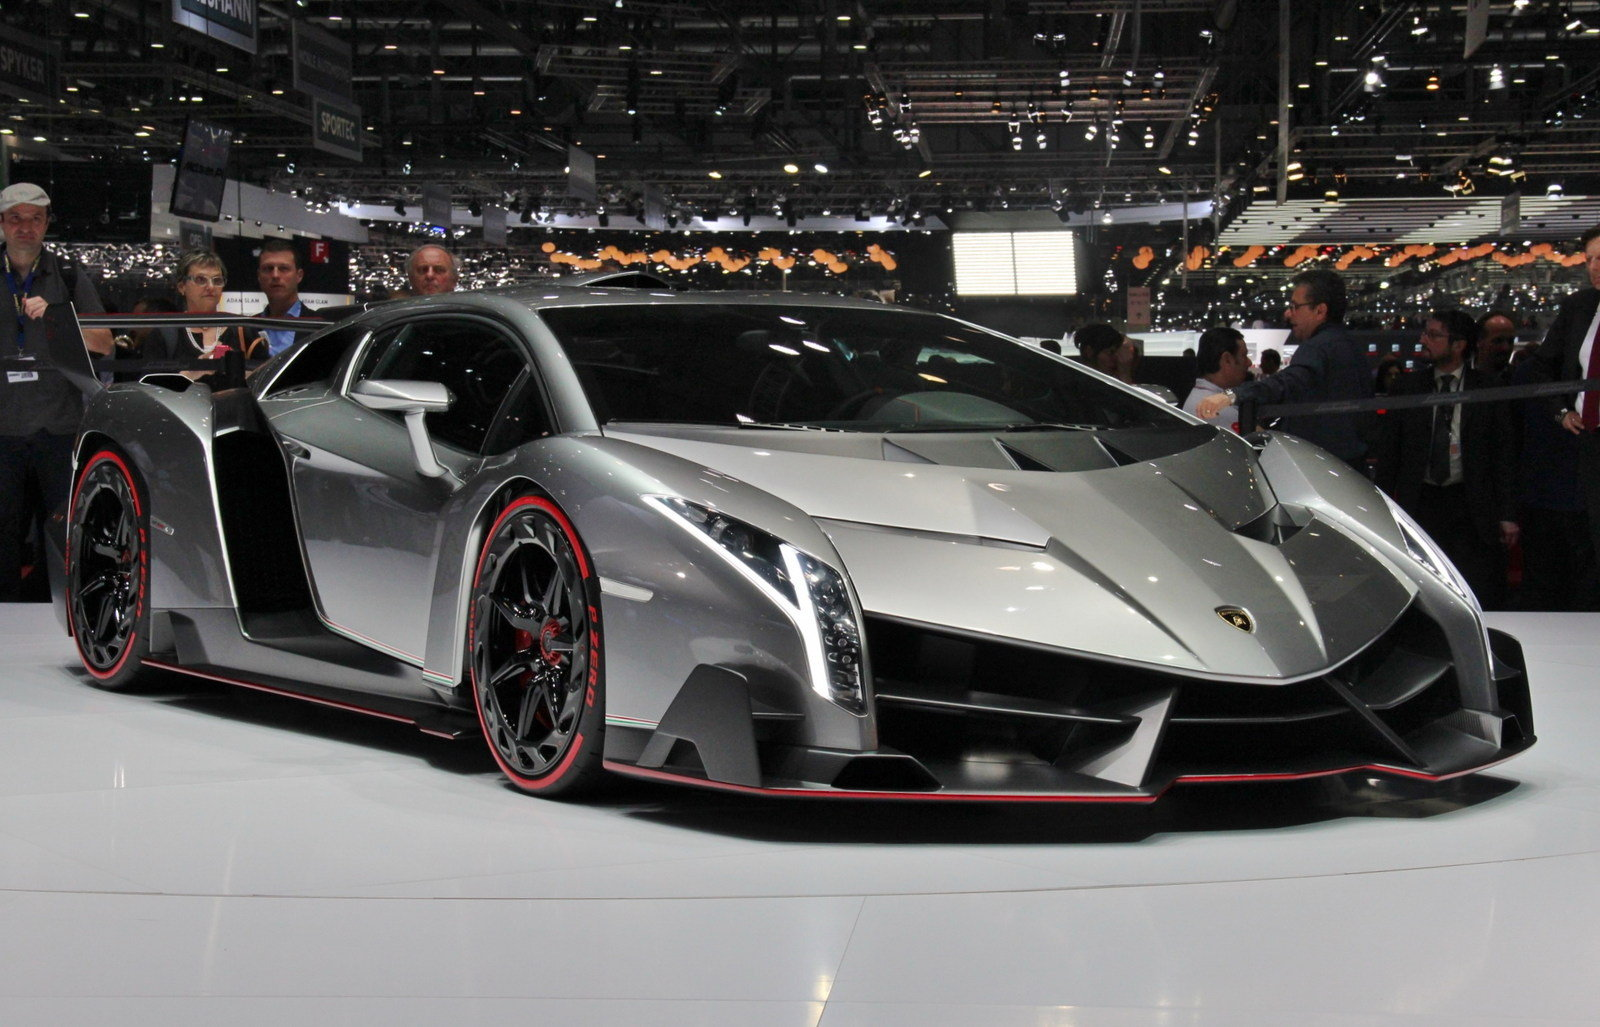 Lamborghini Egoista Hd Wallpapers 1080p Lamborghini Egoista Side